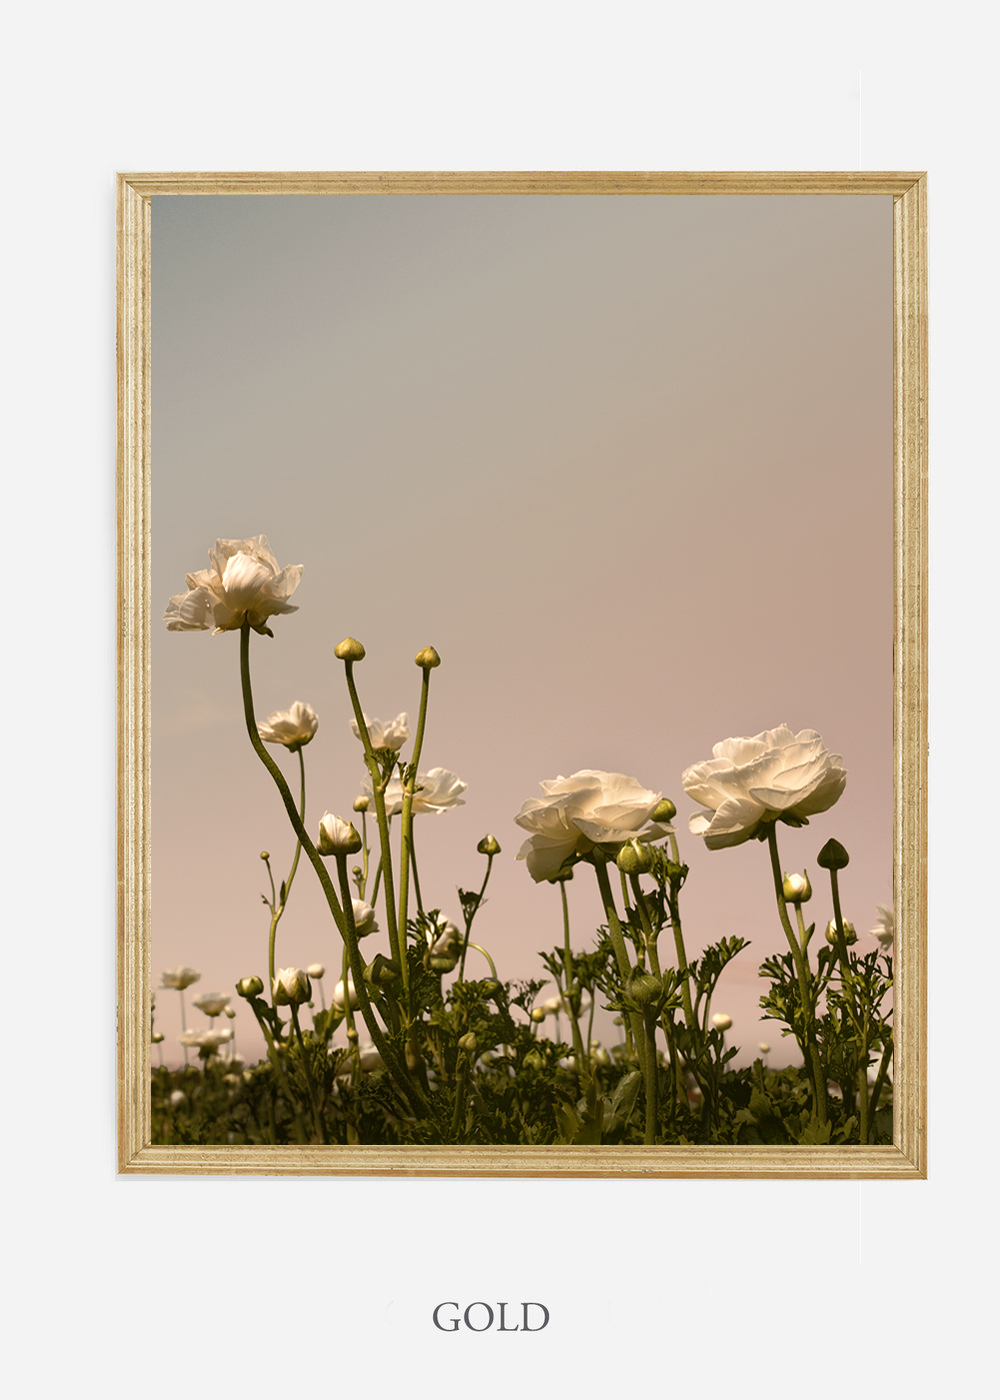 NoMat-Gold-Frame-Floral-No-7-Wilder-California-Art-Floral-Home-decor-Prints-Dahlia-Botanical-Artwork-Interior-design.jpg